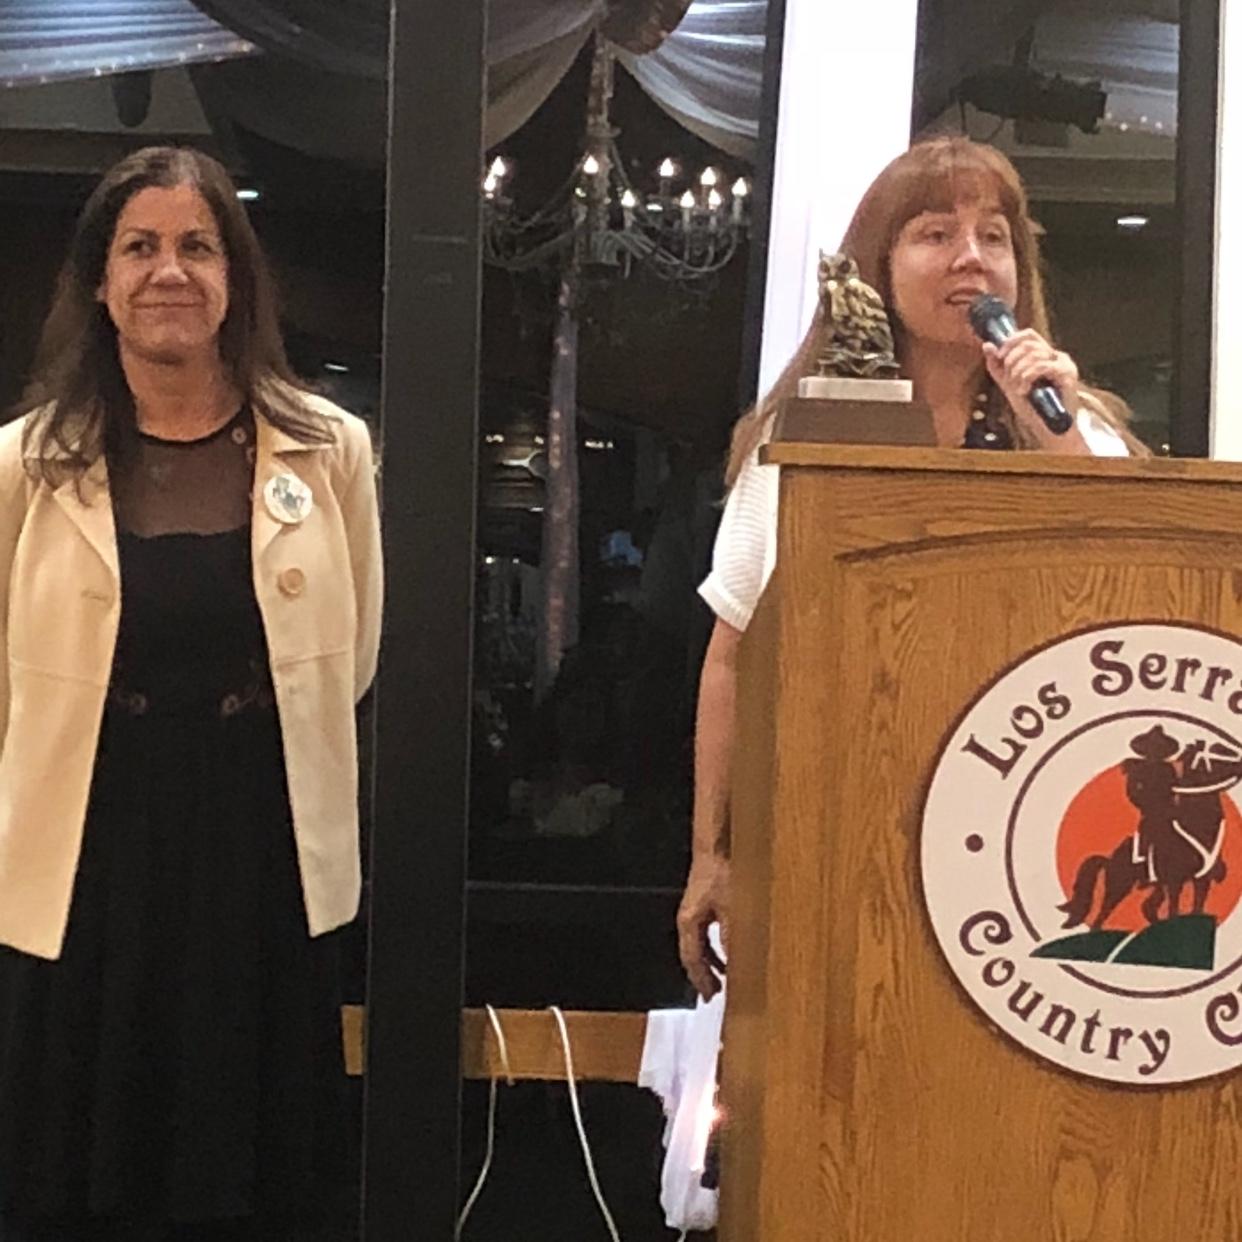 Laura Gaber,MVTA President, honoring Leticia Urias, Vice President and Bargaining Team Member.